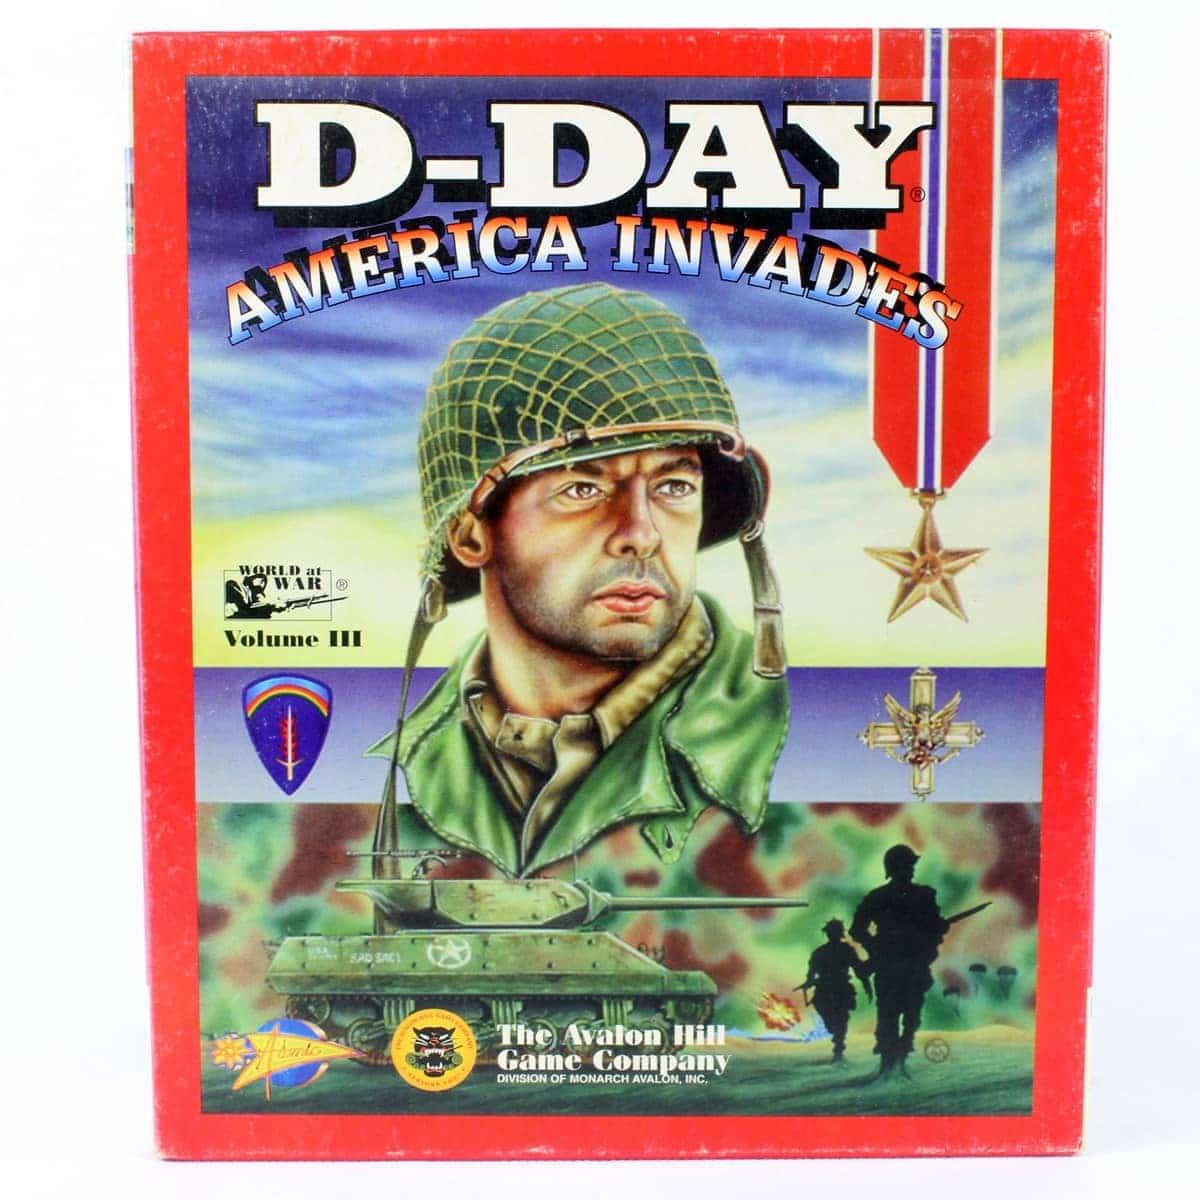 D-Day: America Invades (PC Big Box, 1995, Atomic Games / Avalon Hill)